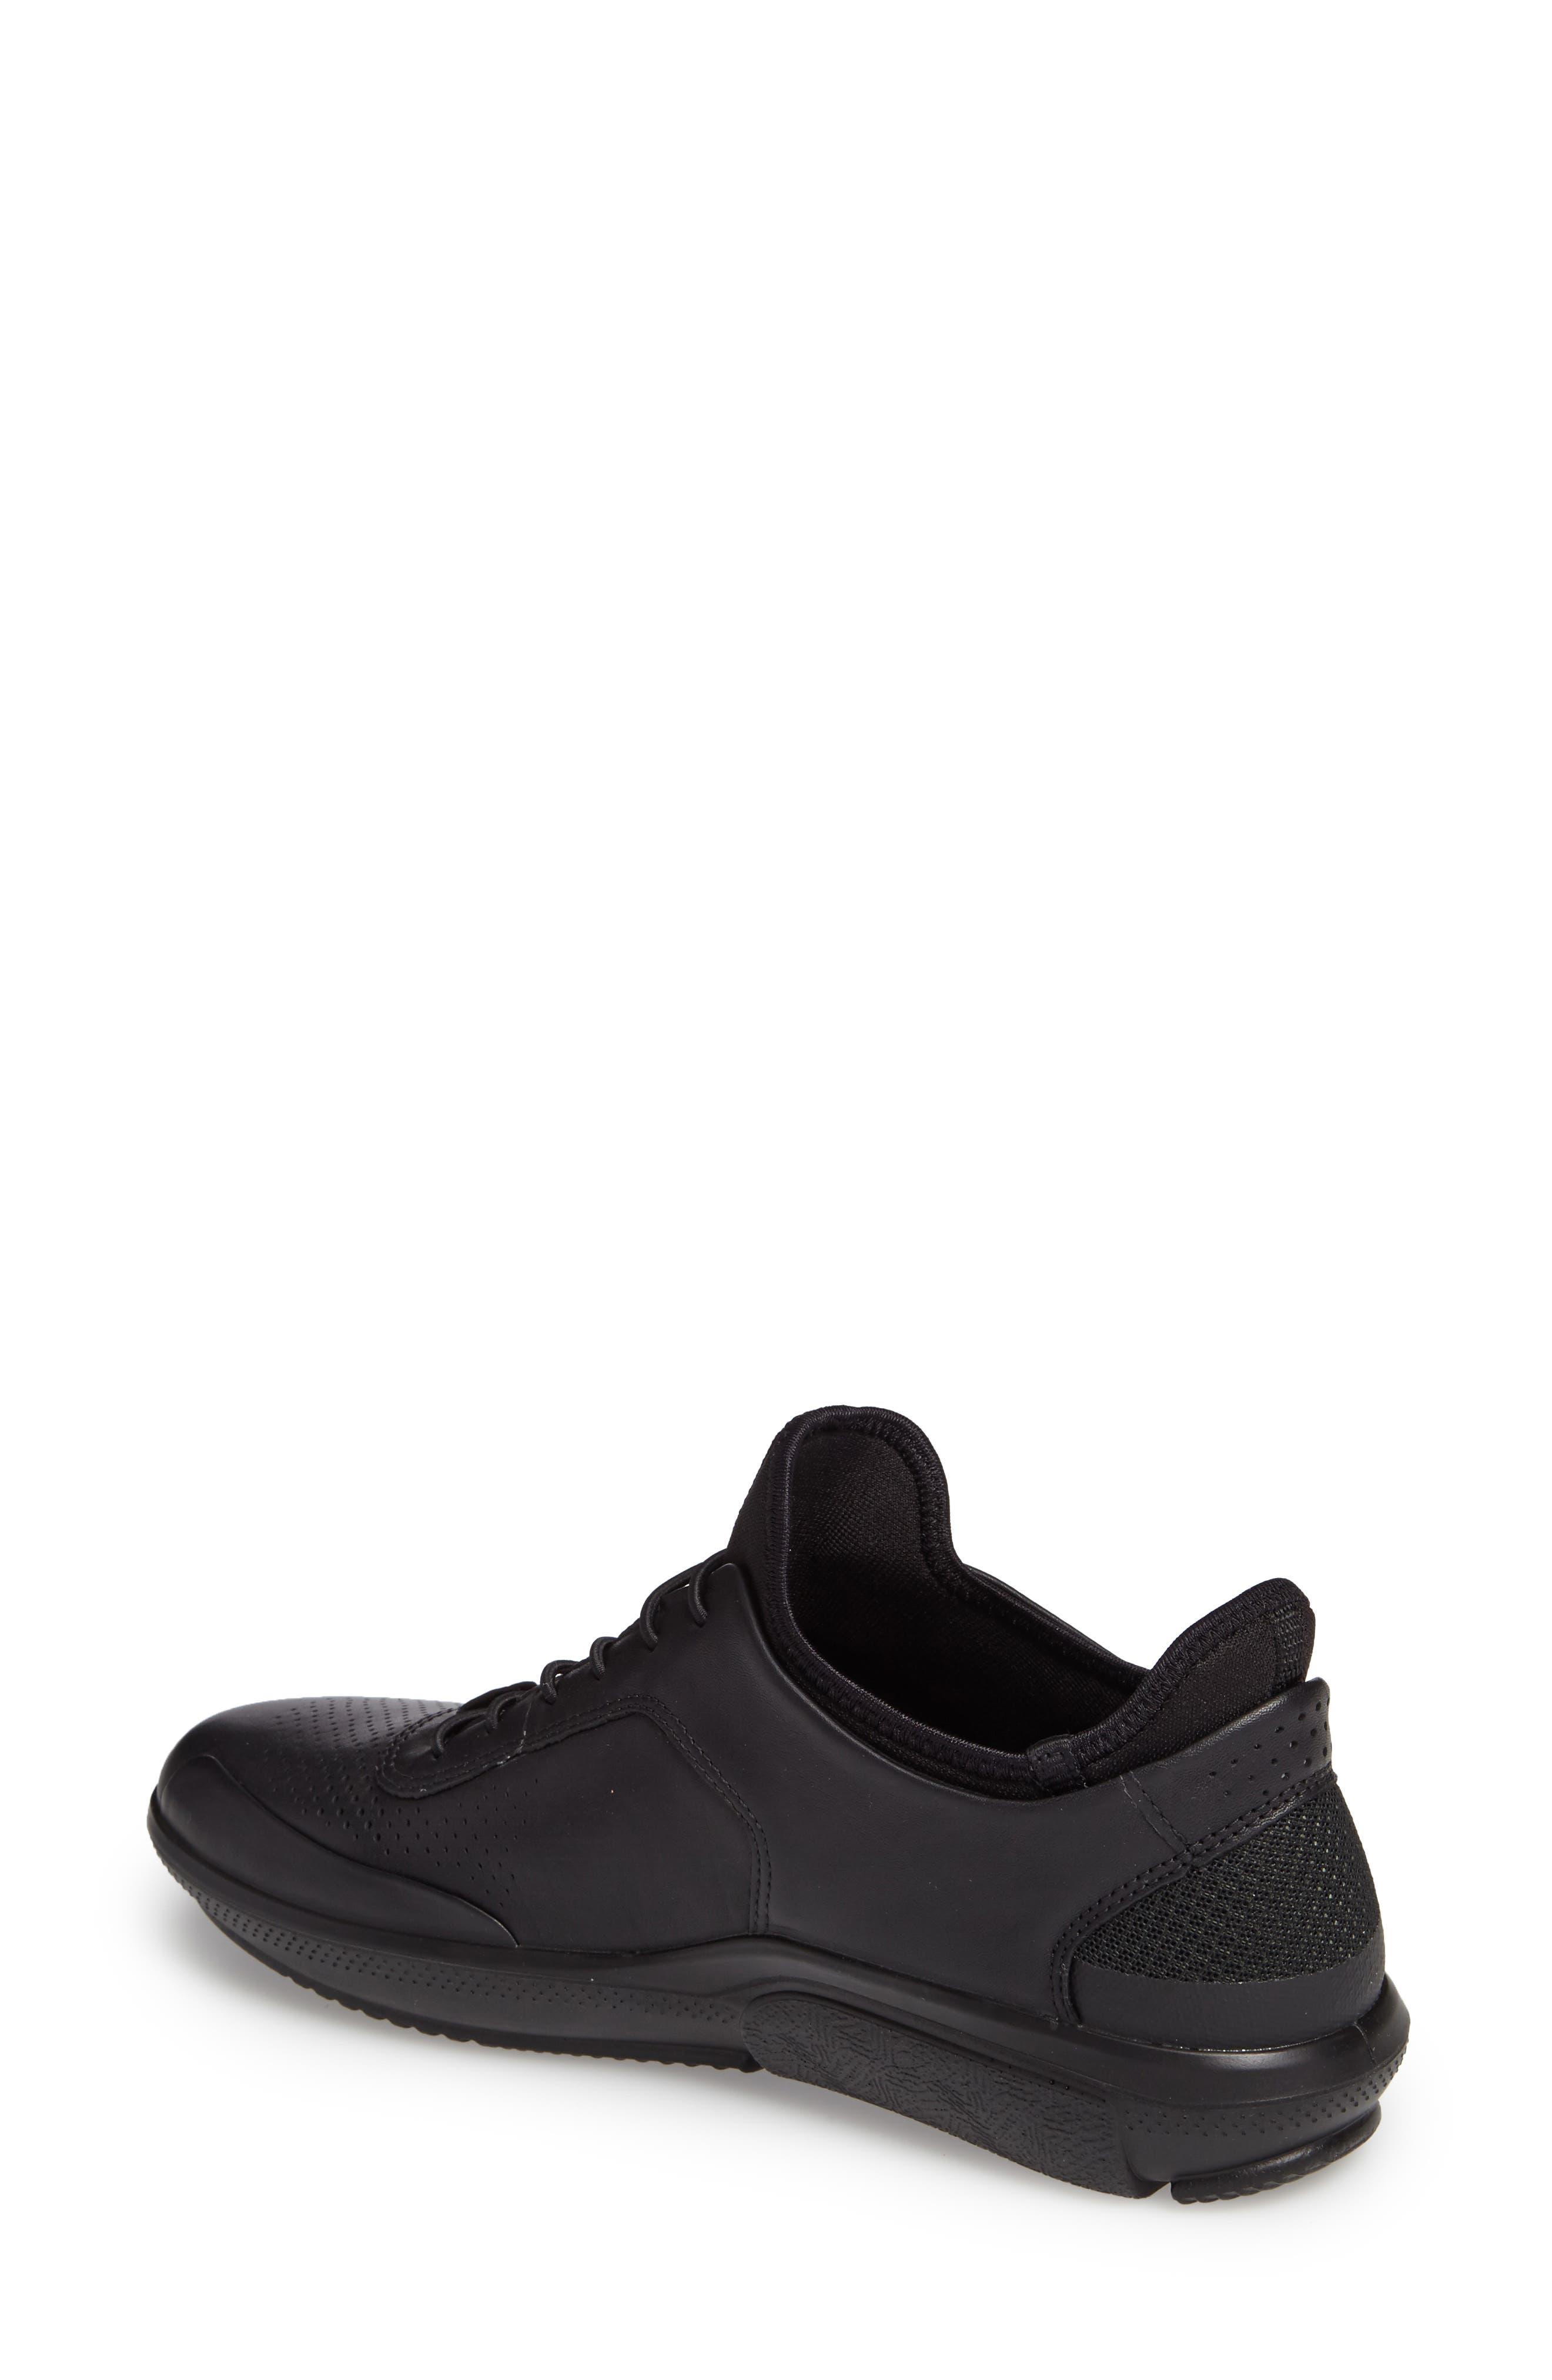 Alternate Image 2  - ECCO Intrinsic 3 Sneaker (Women)